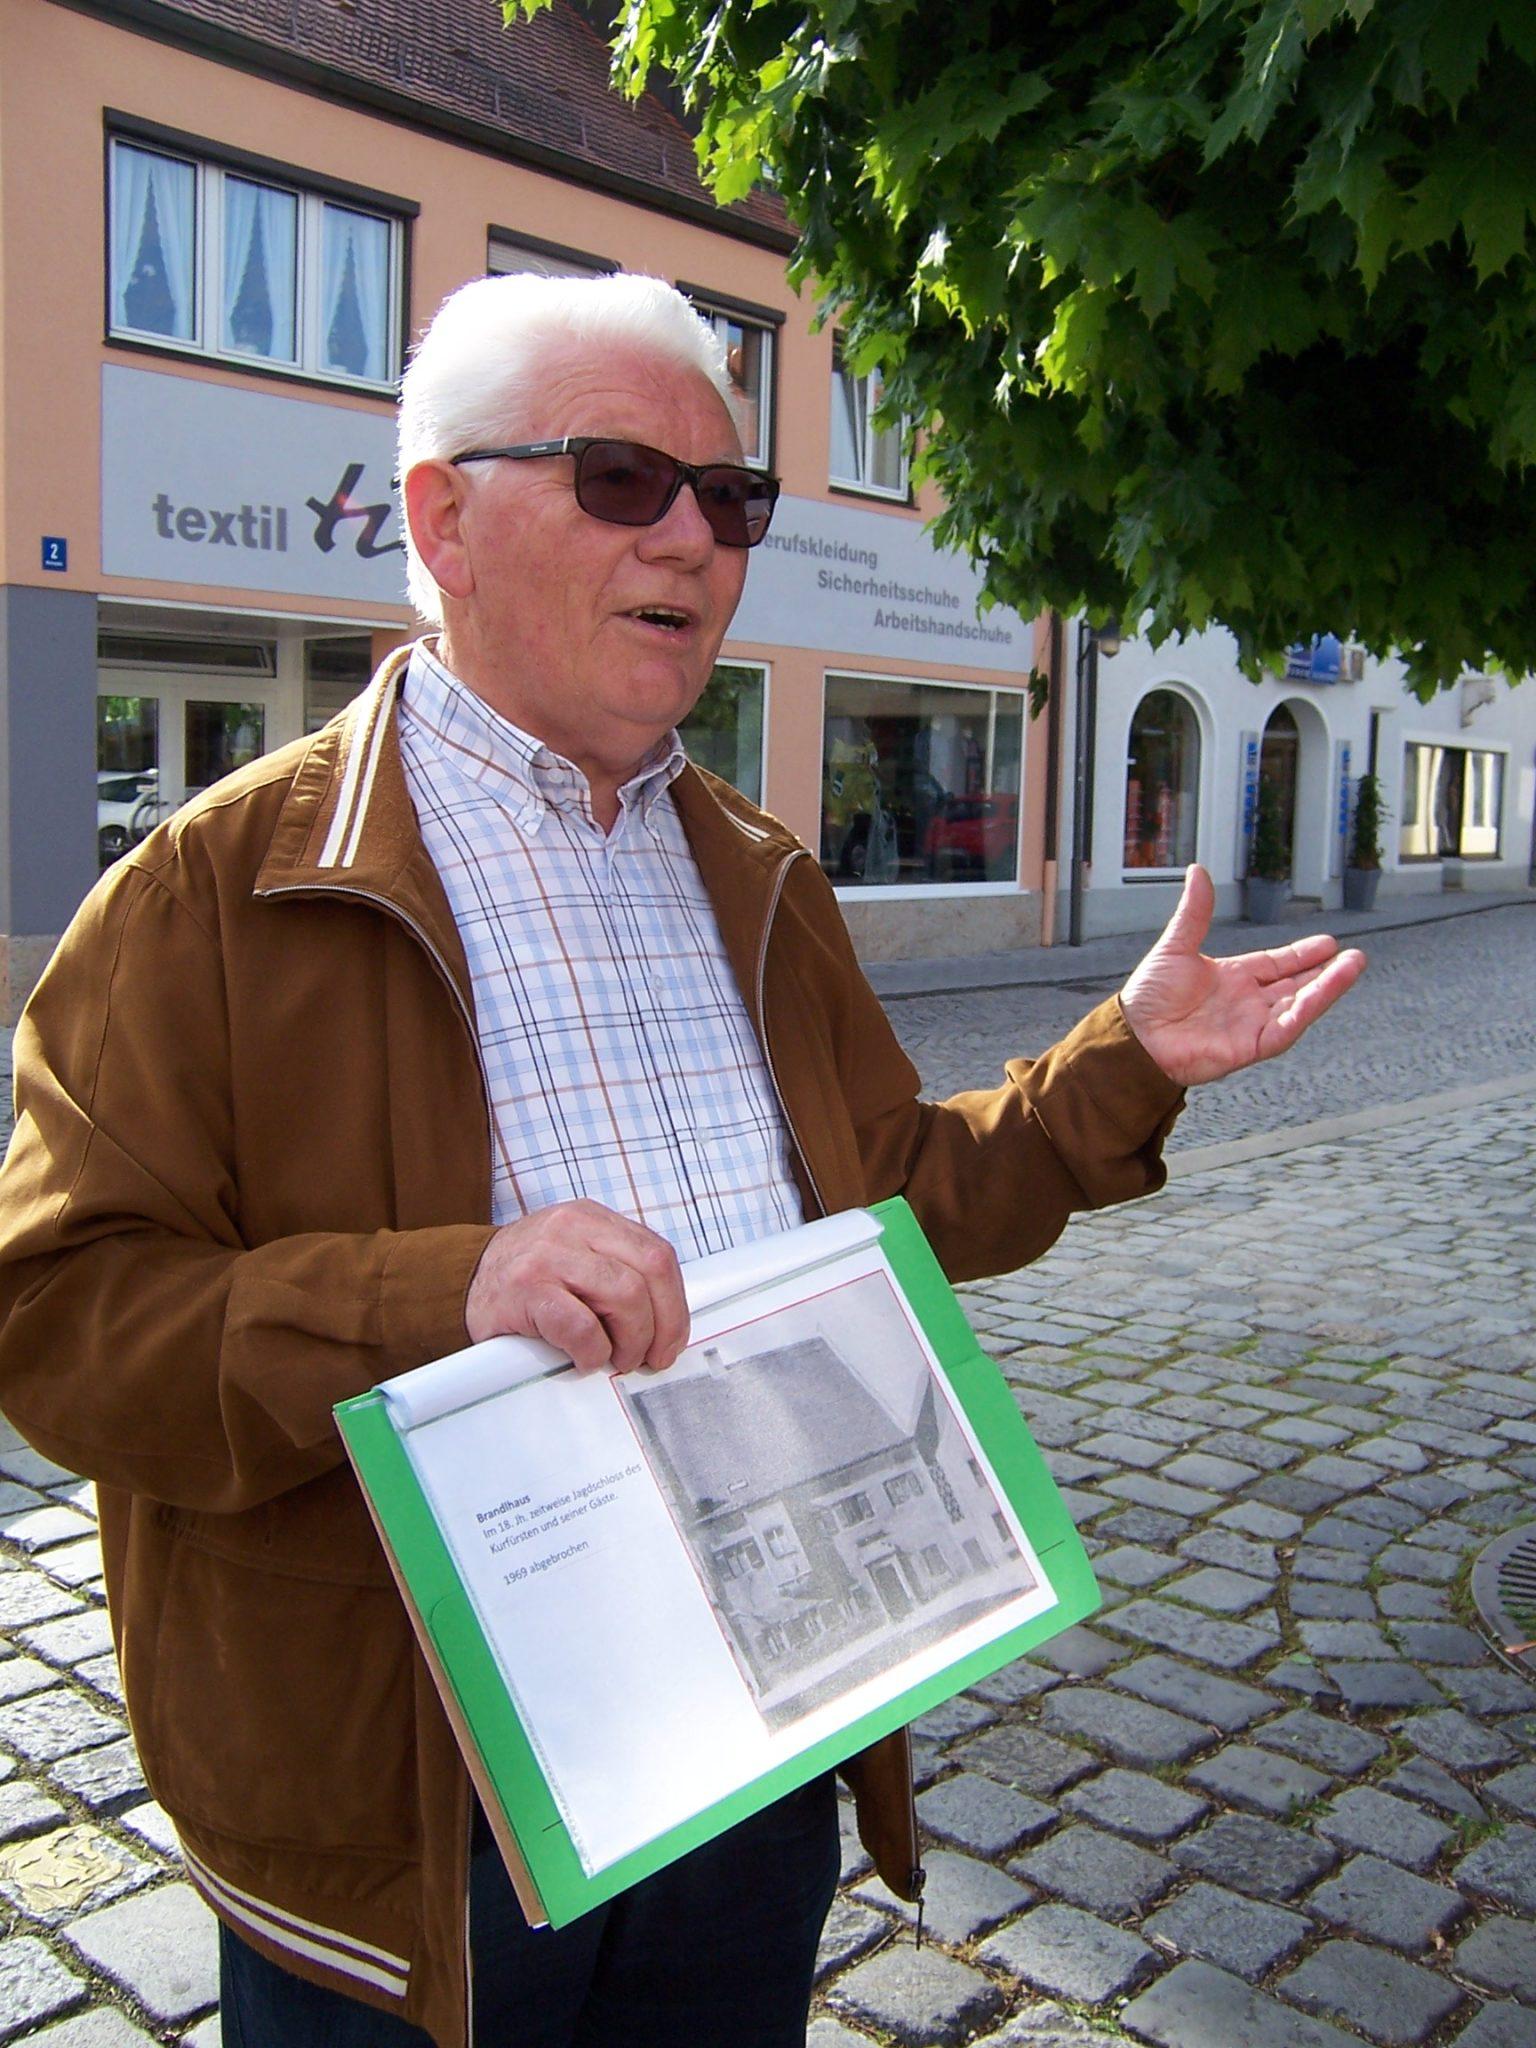 Marktflüsterer Erich Niedermeier